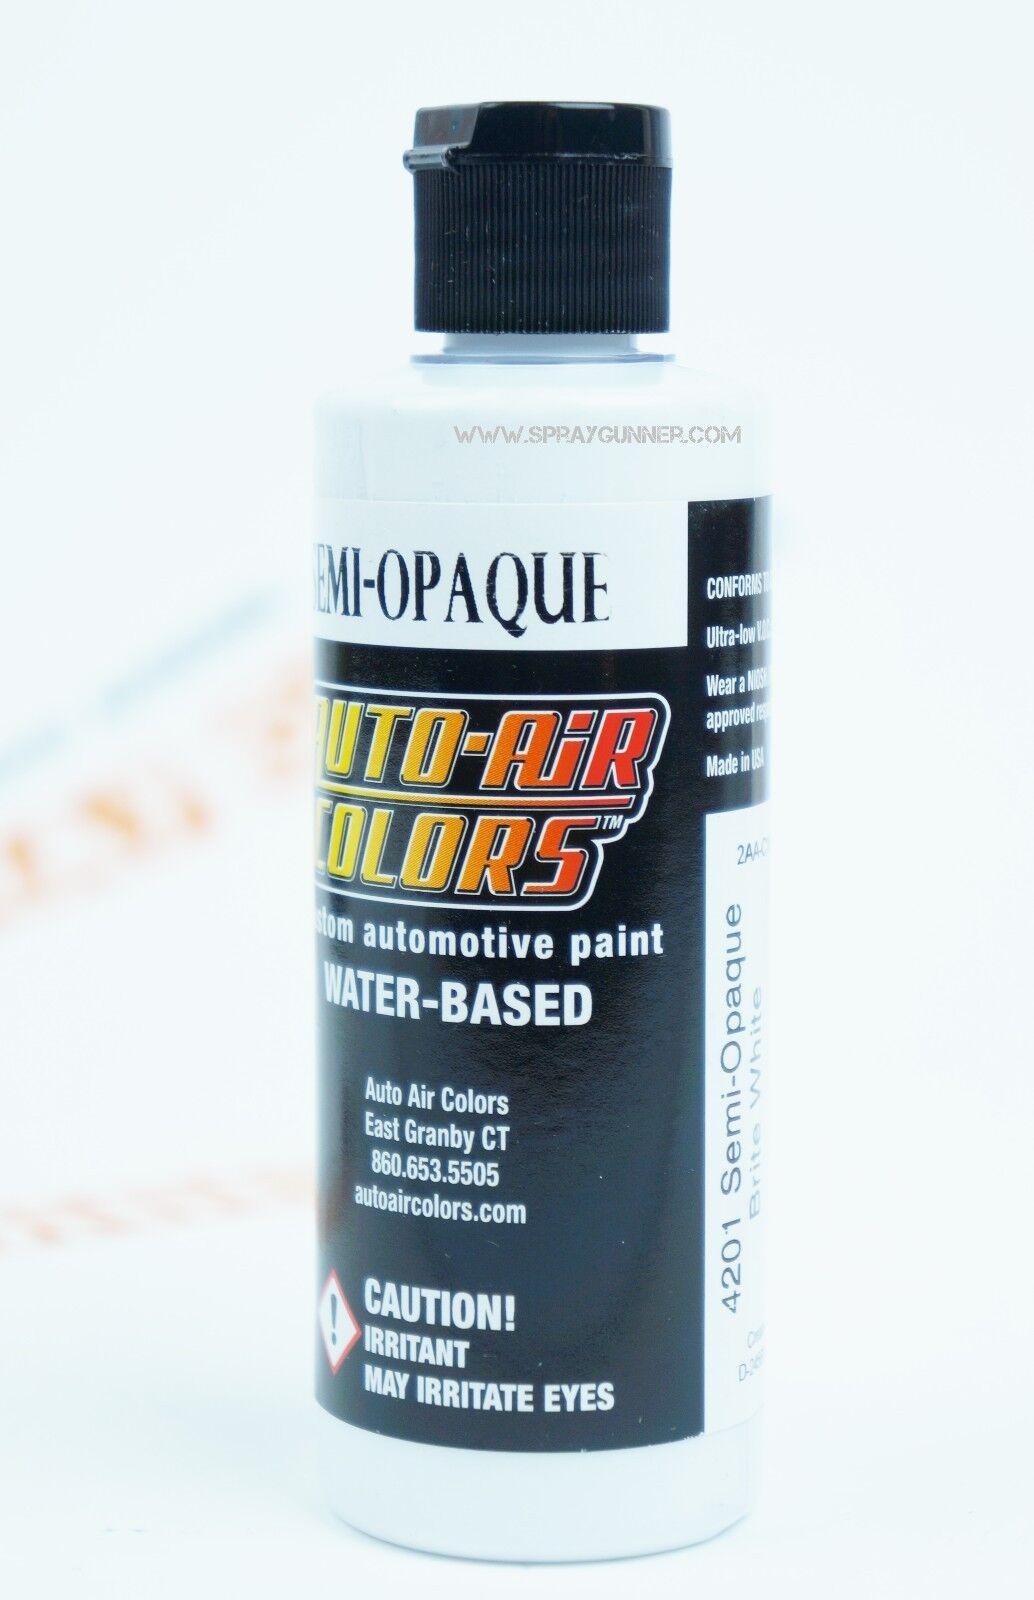 Createx Auto-Air Colors 4oz Semi-Opaque Brite White 4201 Cus